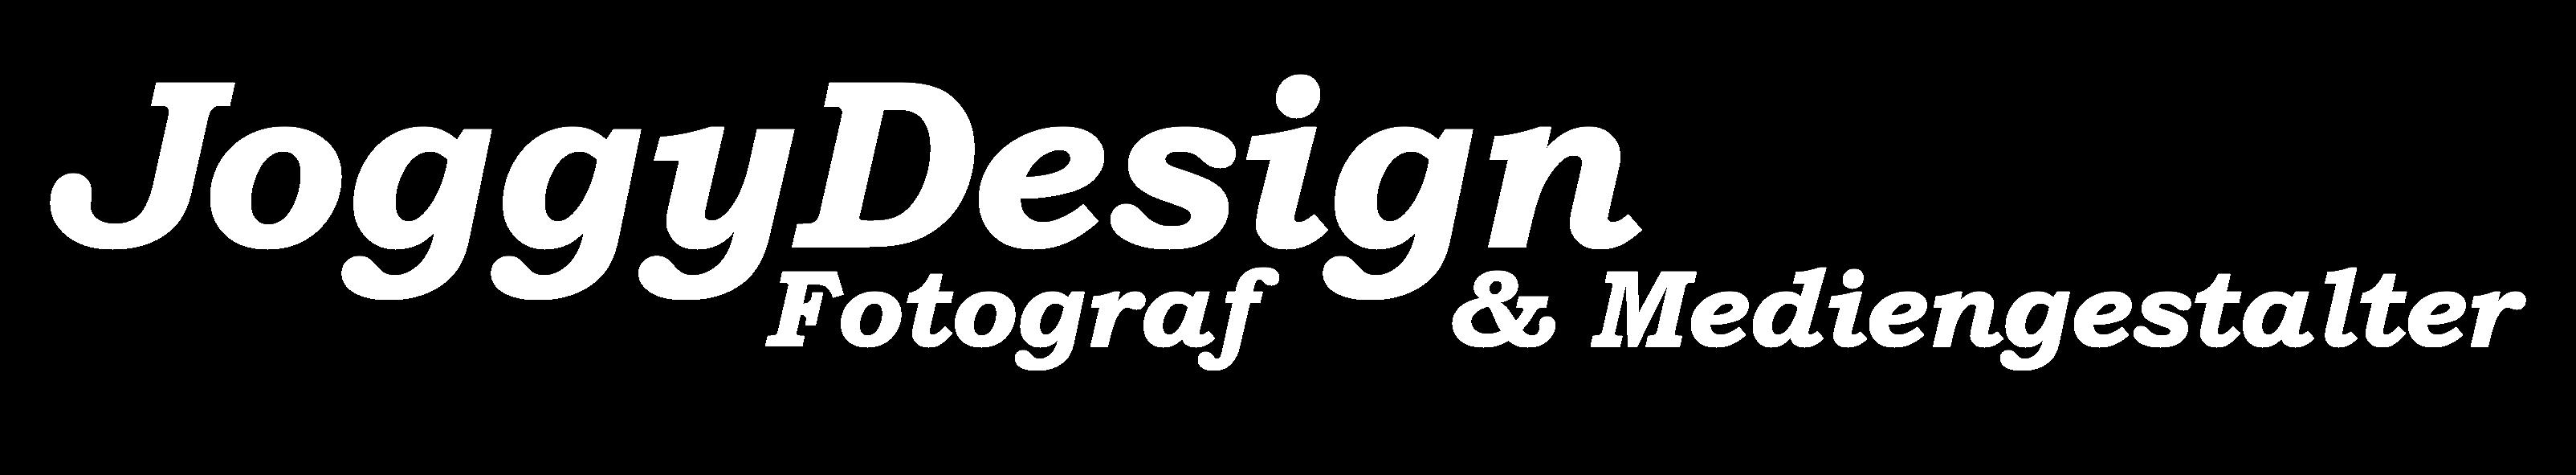 JoggyDesign